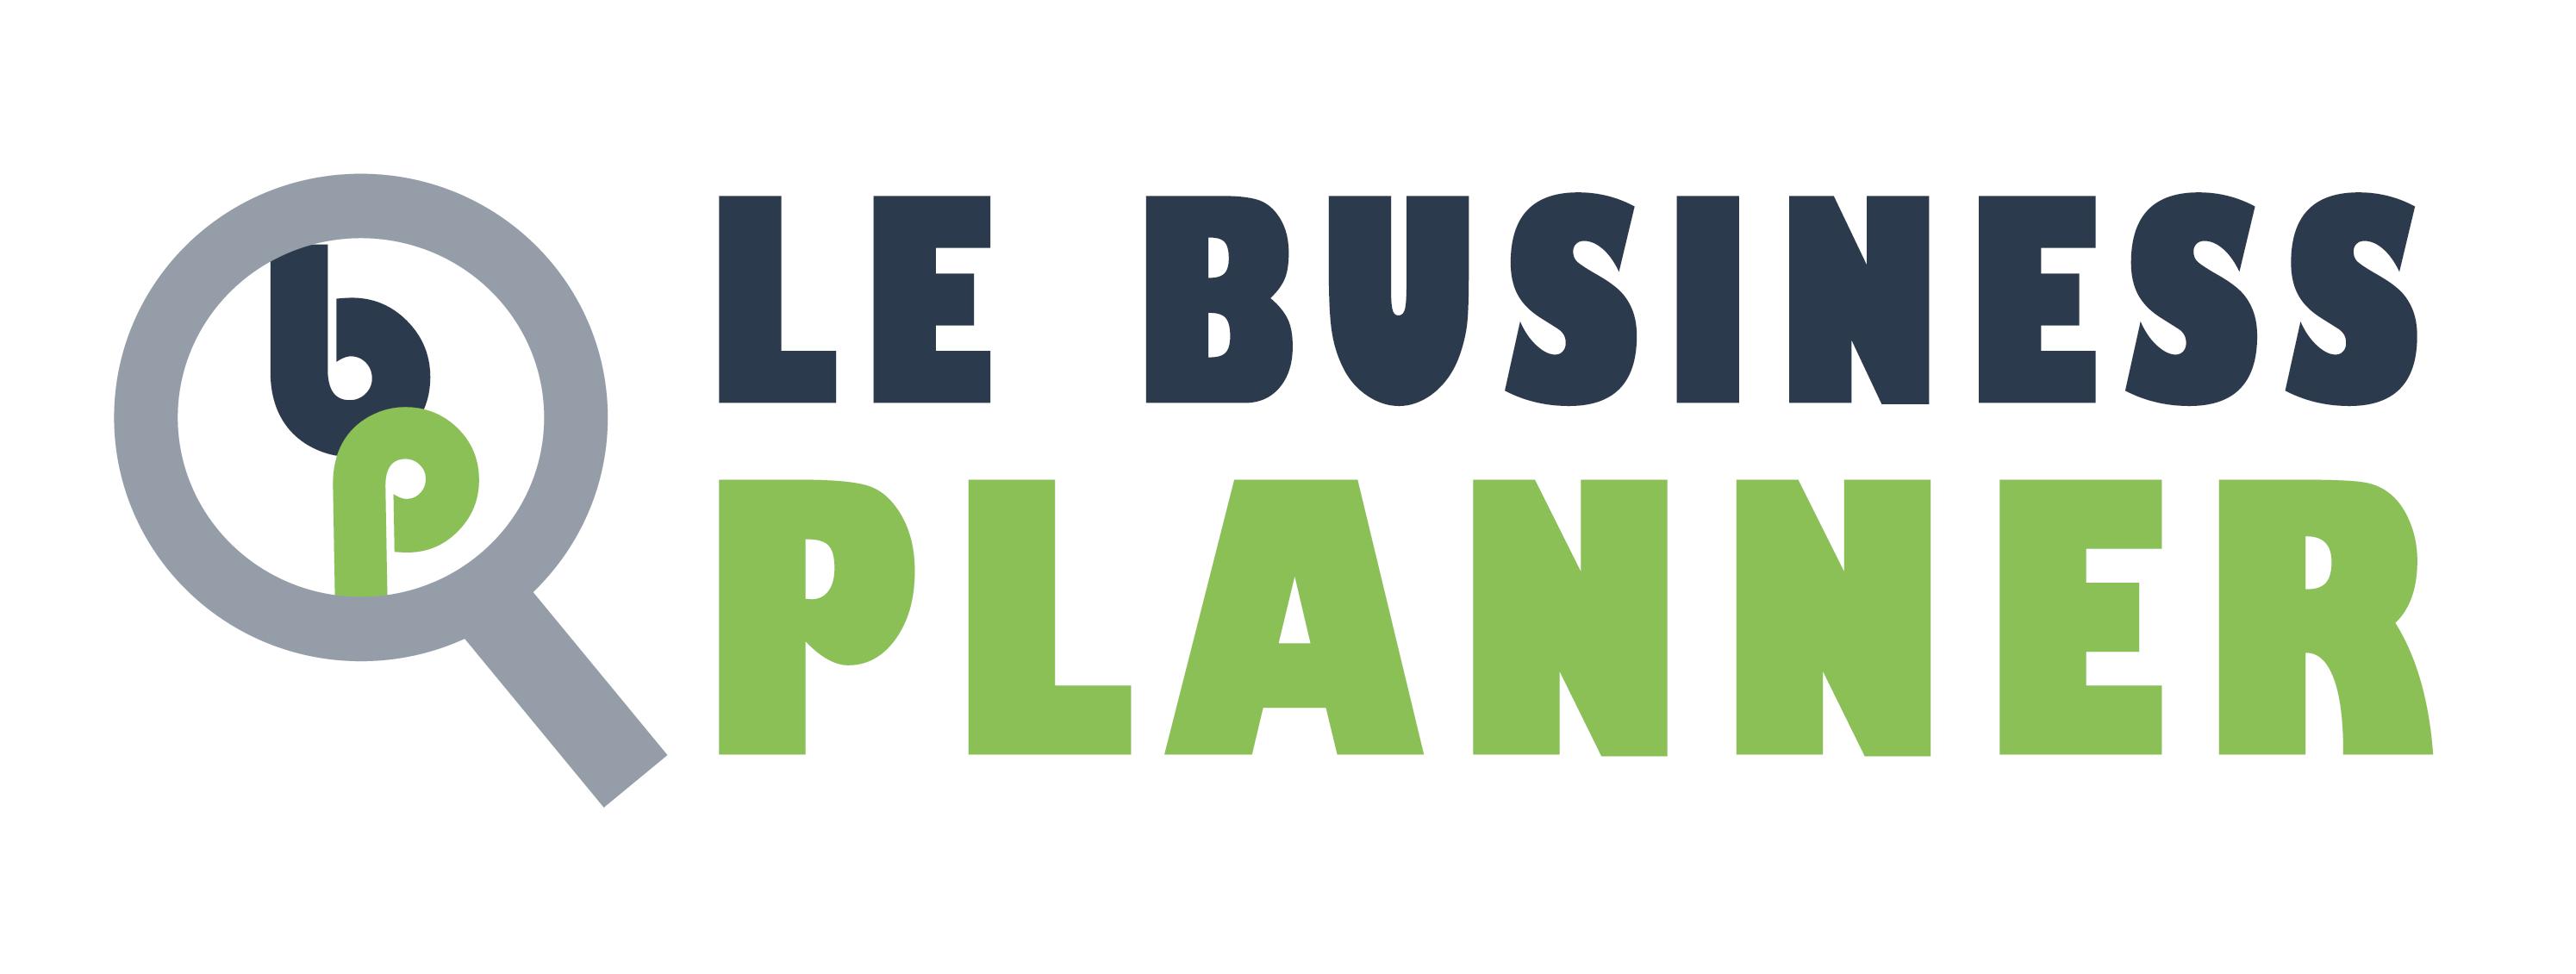 Le Business Planner